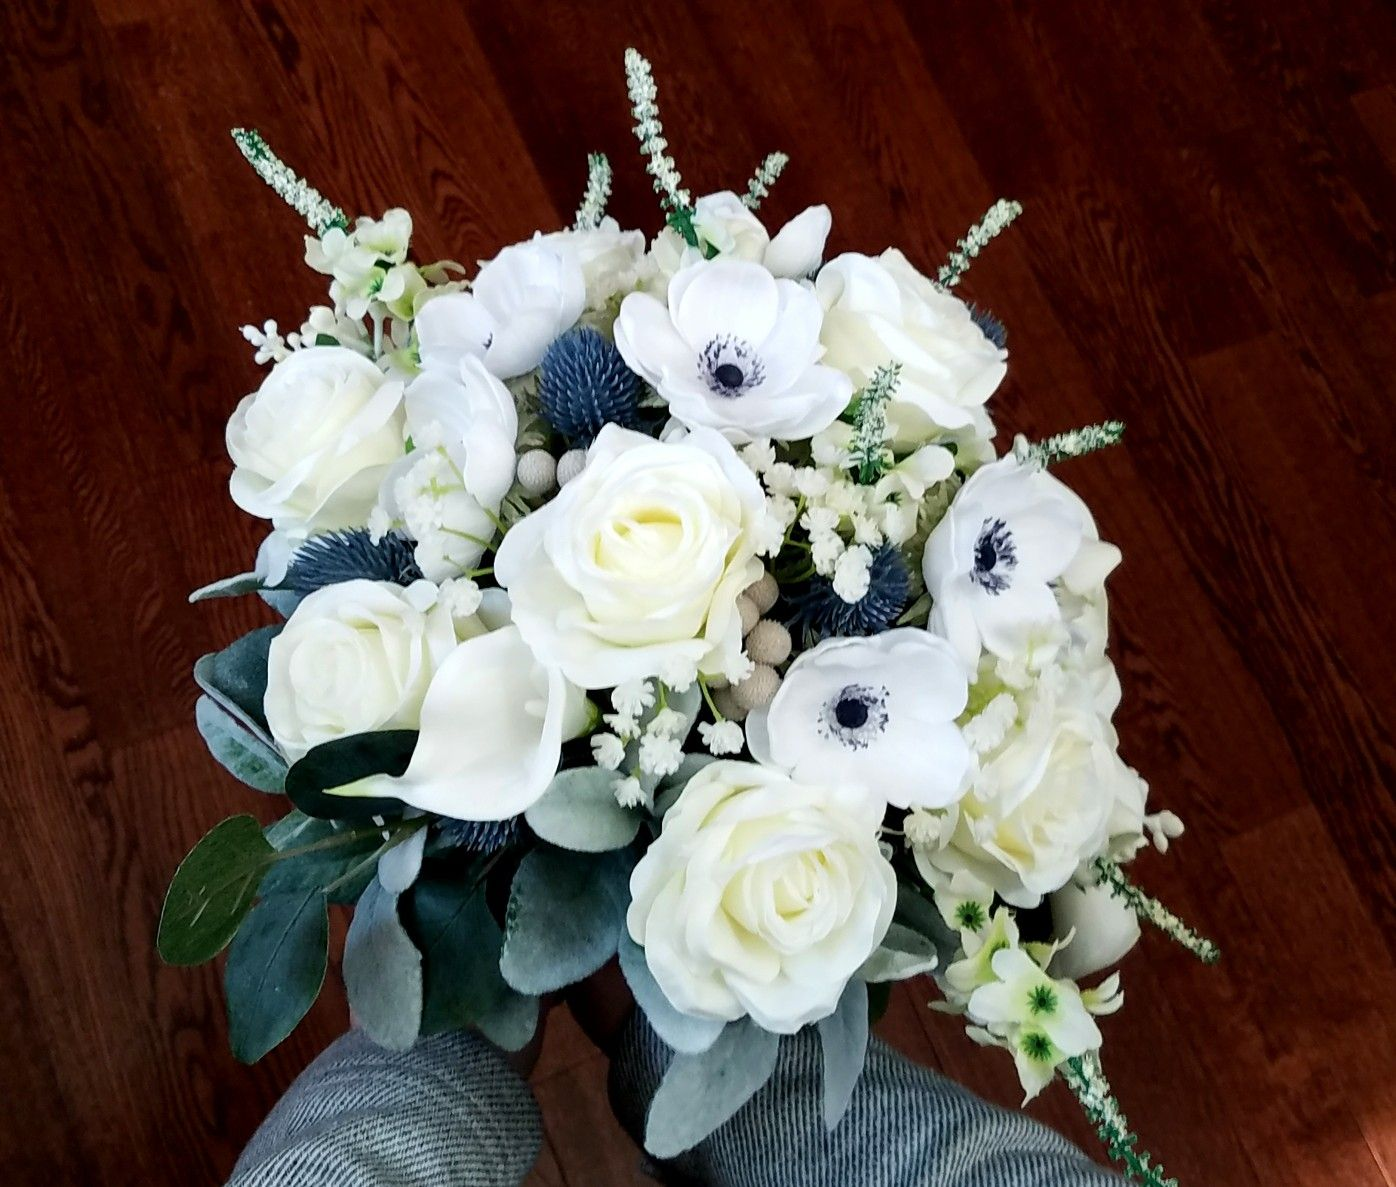 Gorgeous cascading bridal bouquet contact chicago silk florist to gorgeous cascading bridal bouquet contact chicago silk florist to create a beautiful bridal bouquet mightylinksfo